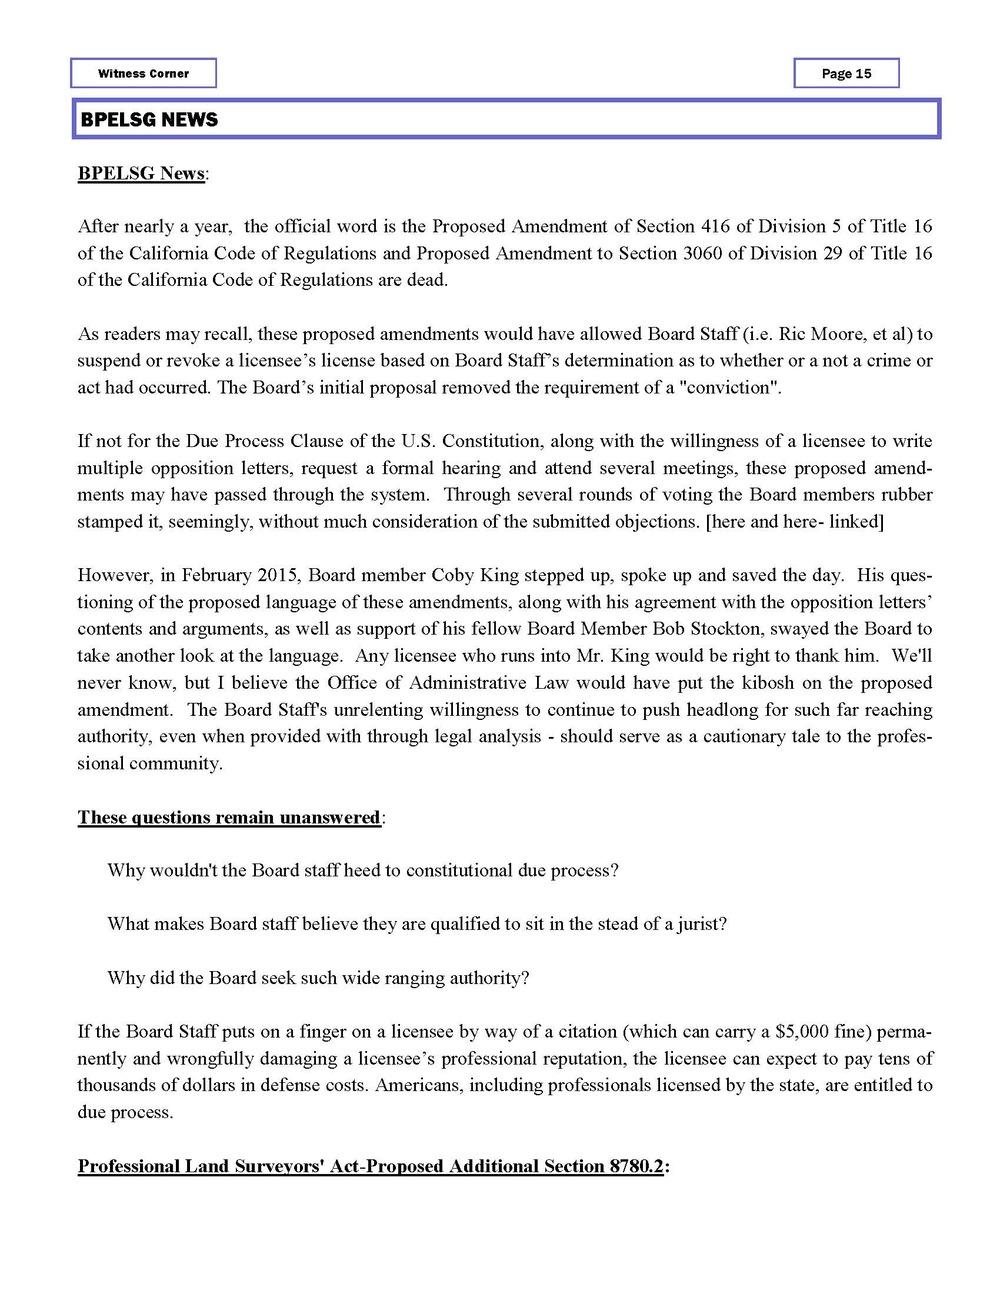 OC-CLSA 082015 Newsletter_Page_18.jpg